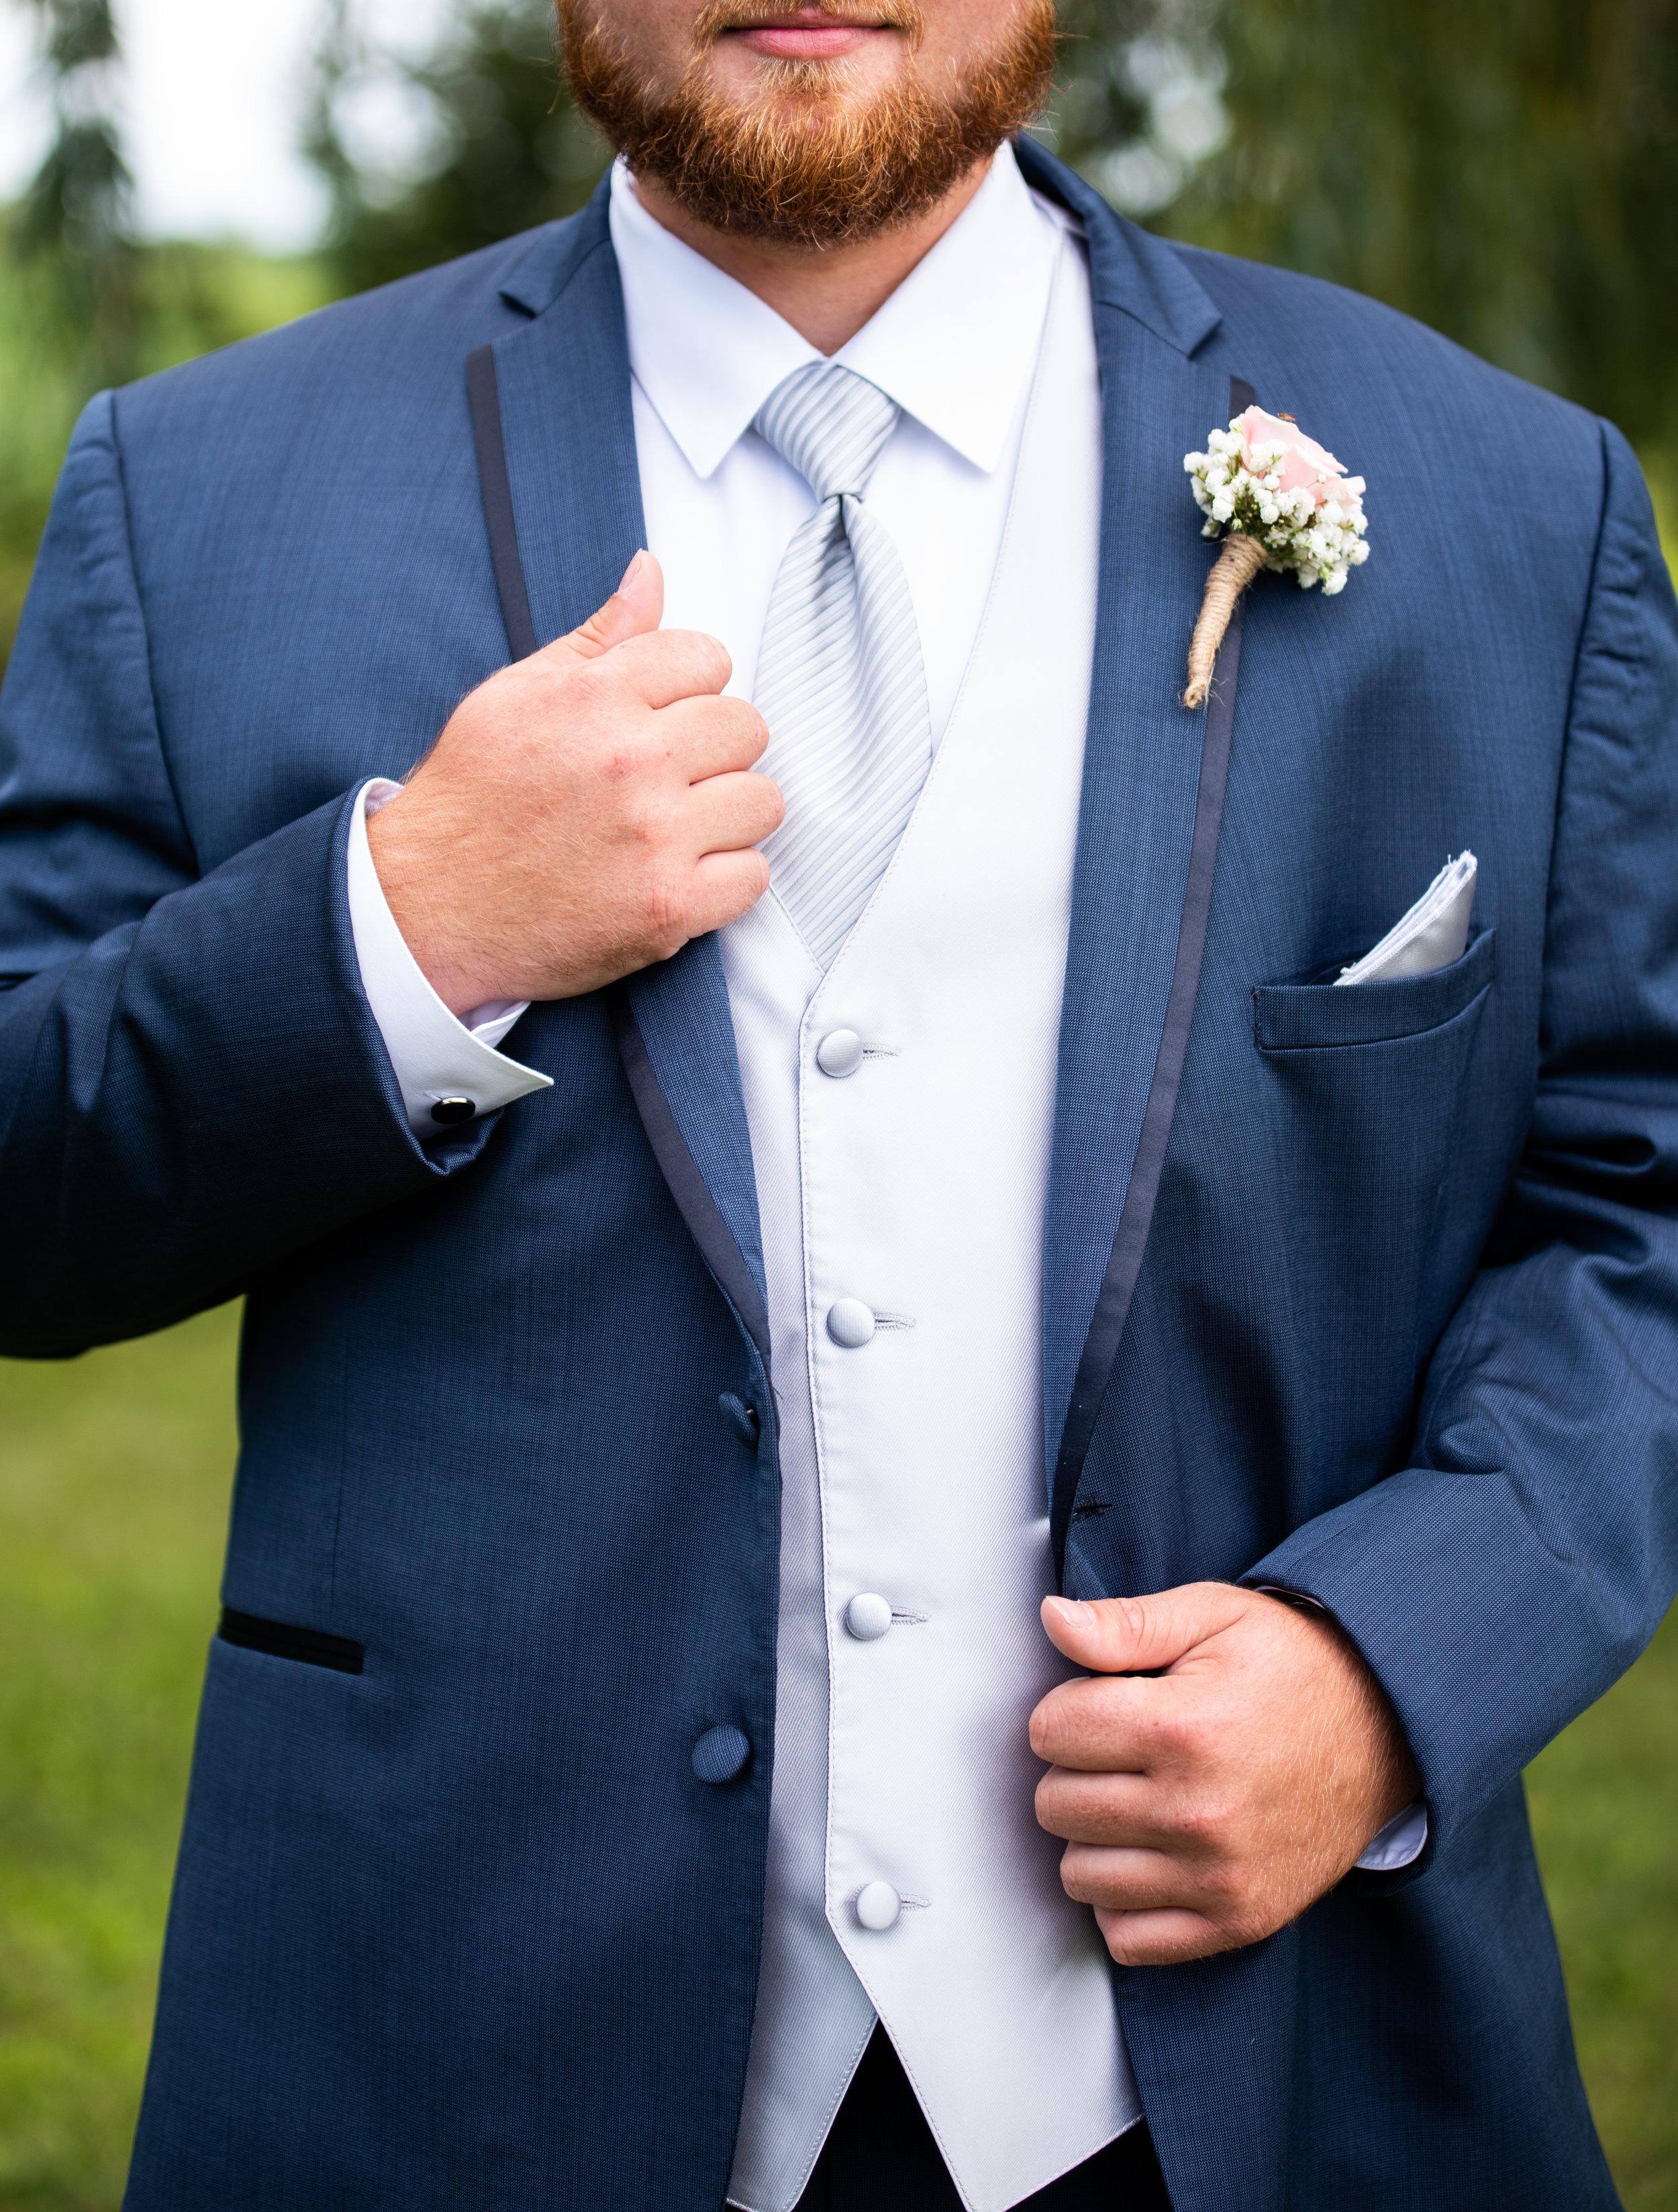 wedding (1 of 1)-57.jpg